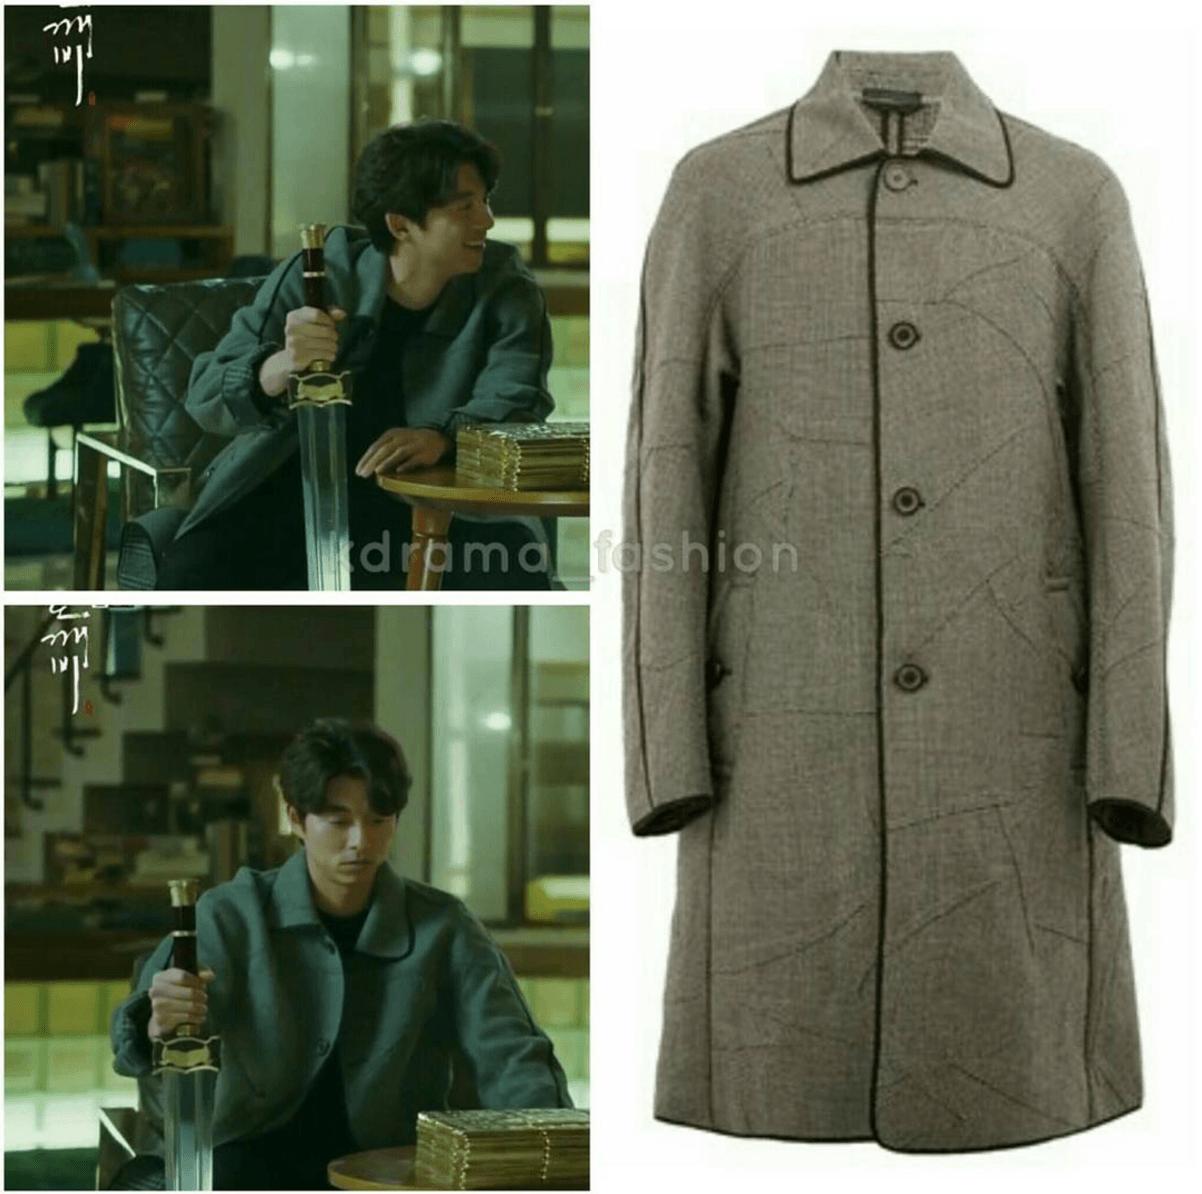 lanvin-stitched-panel-coat